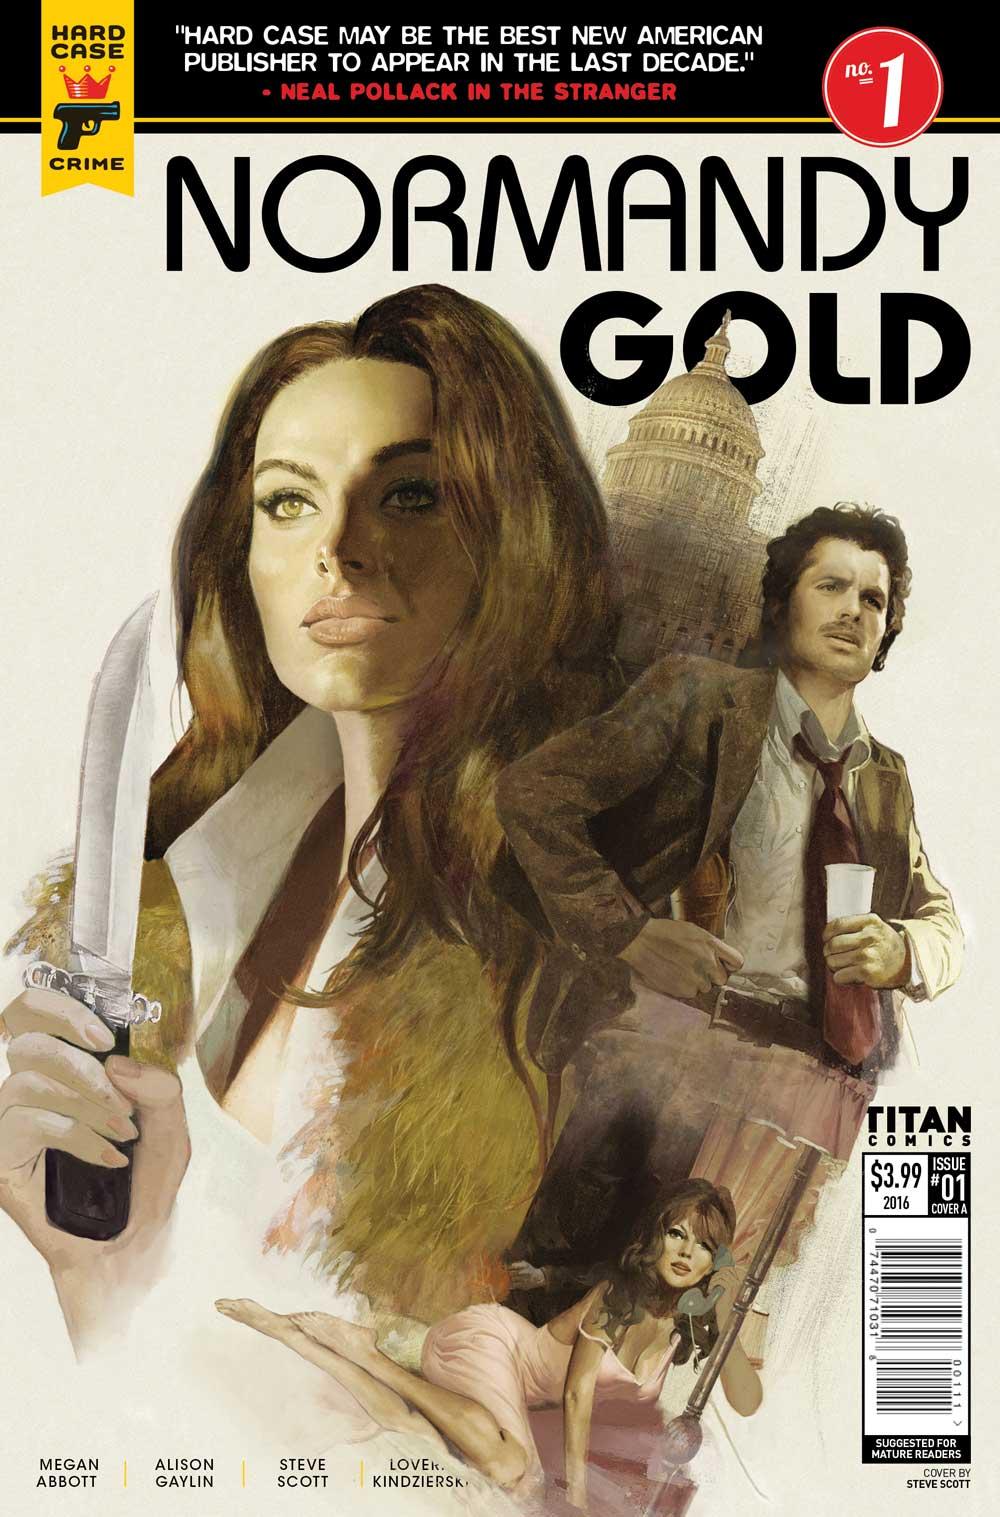 Normandy_Gold_1_Cover-A-Fay-Dalton.jpg